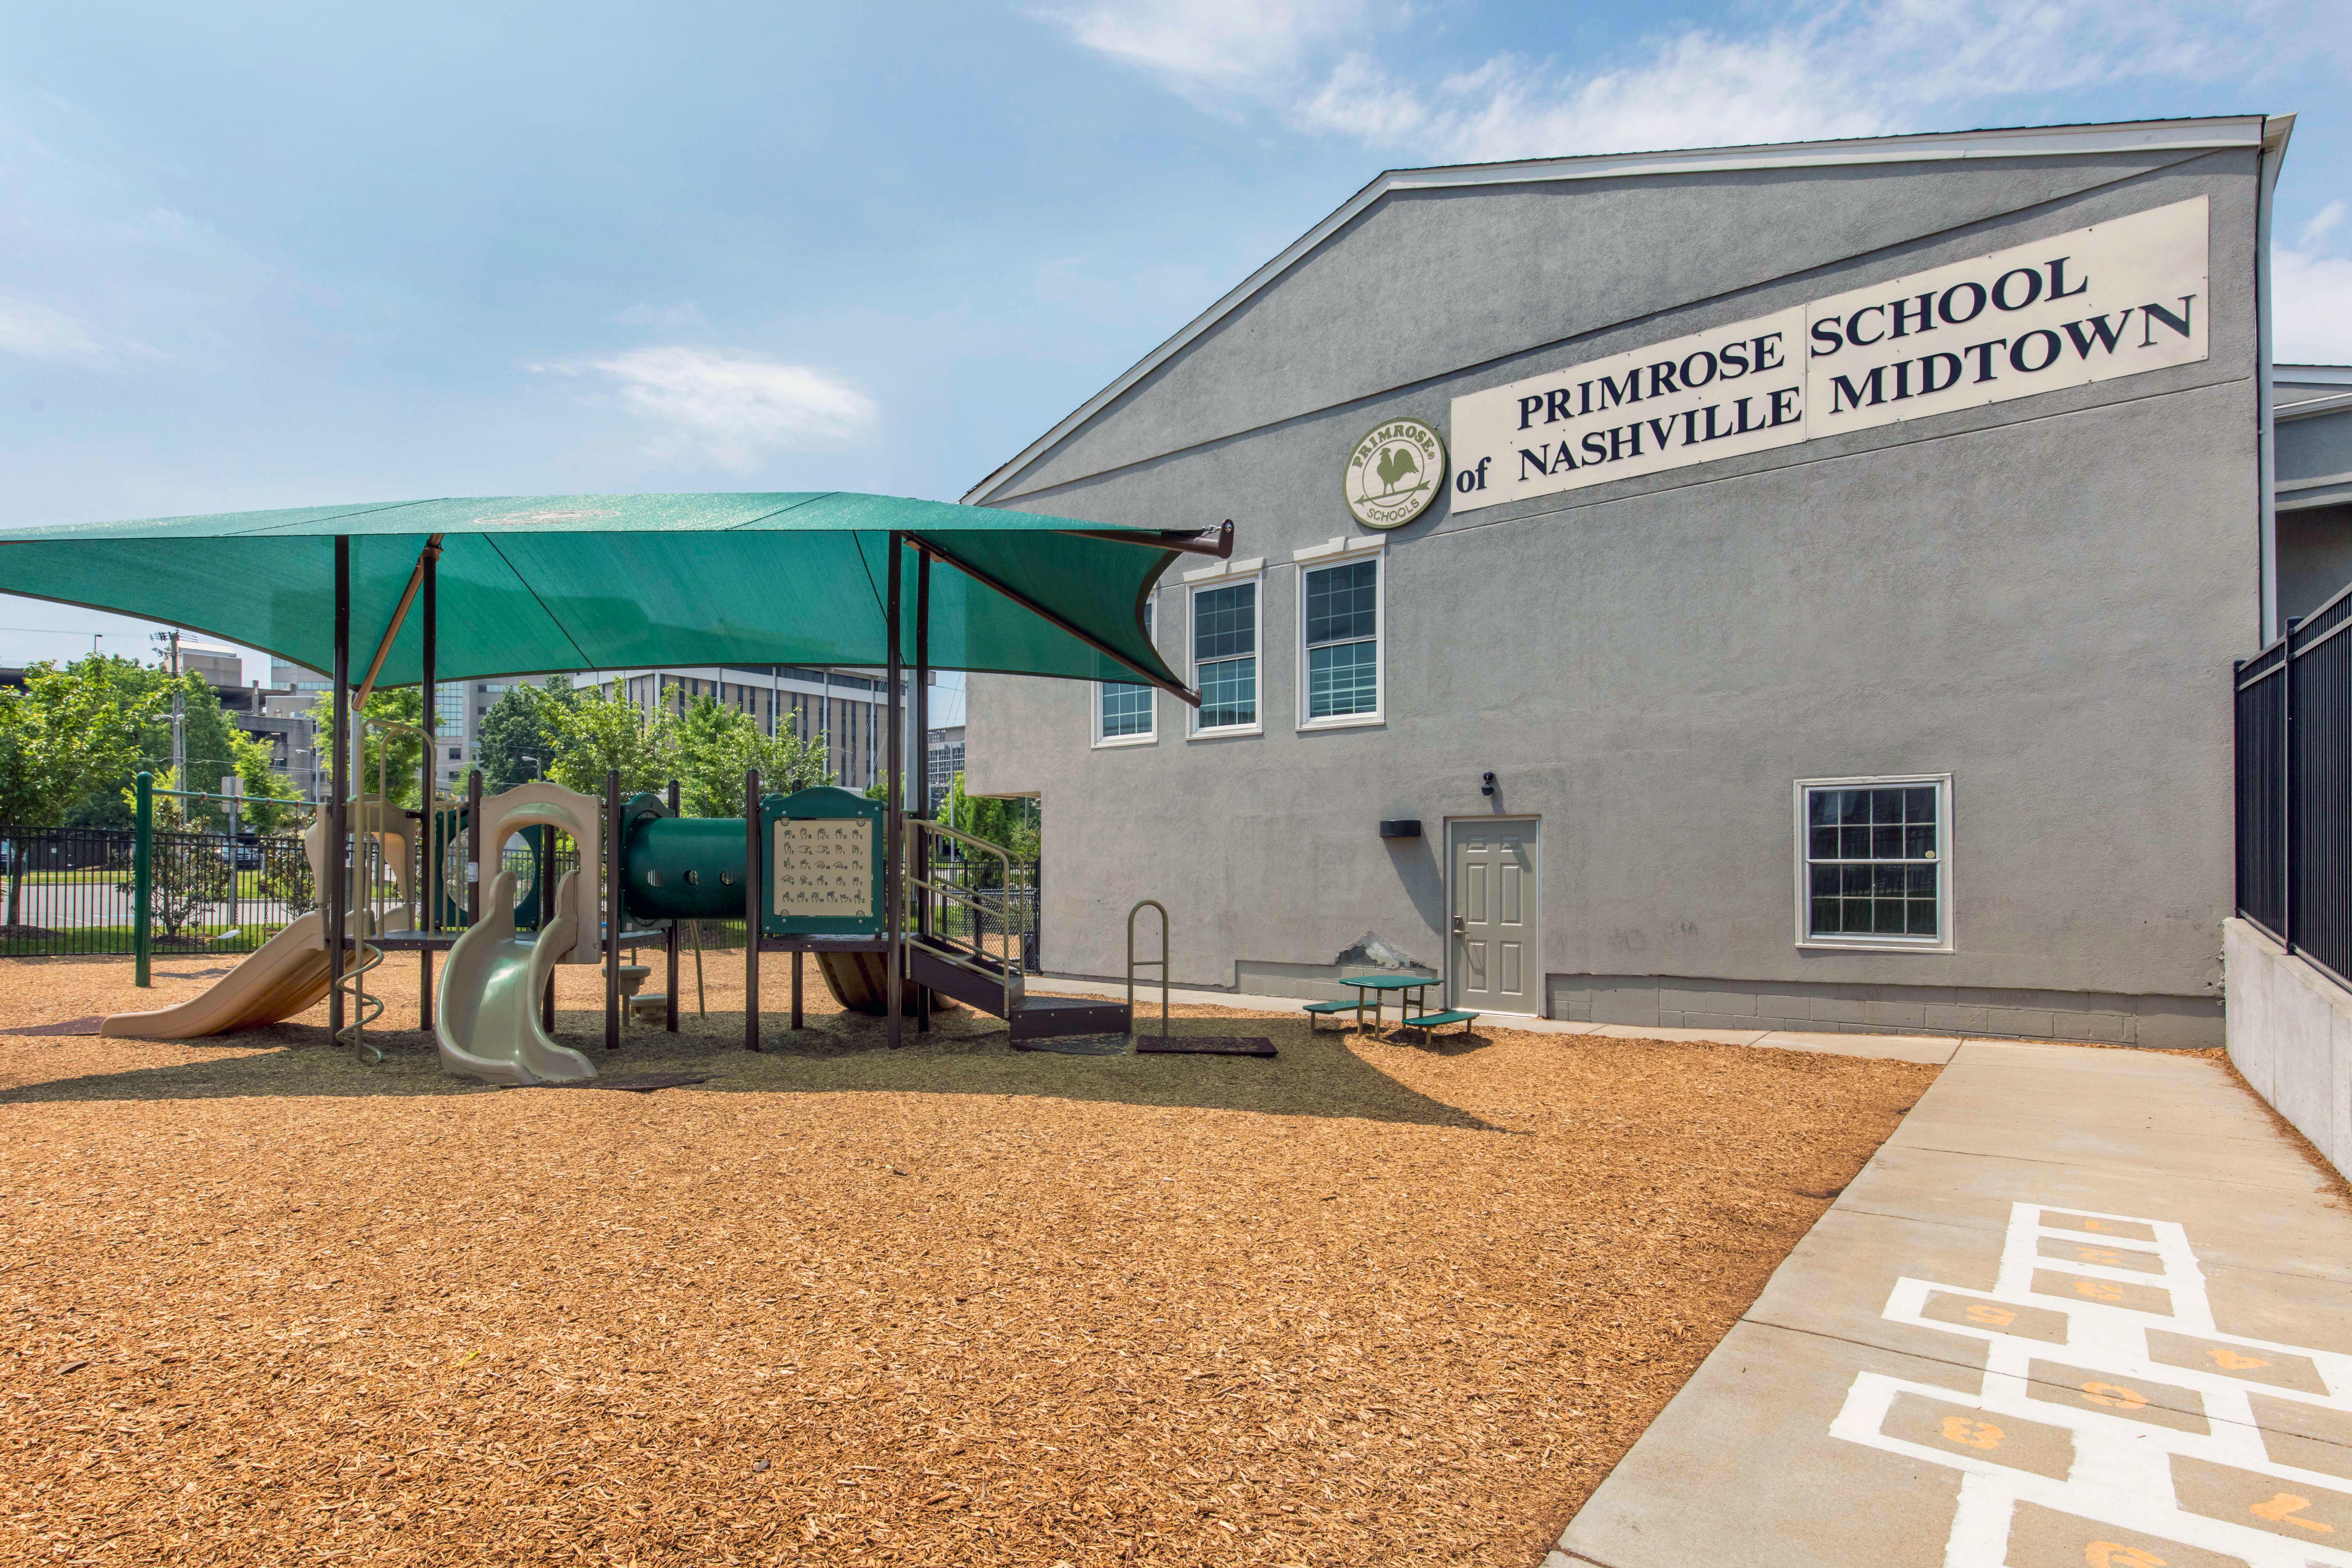 Primrose School of Nashville Midtown